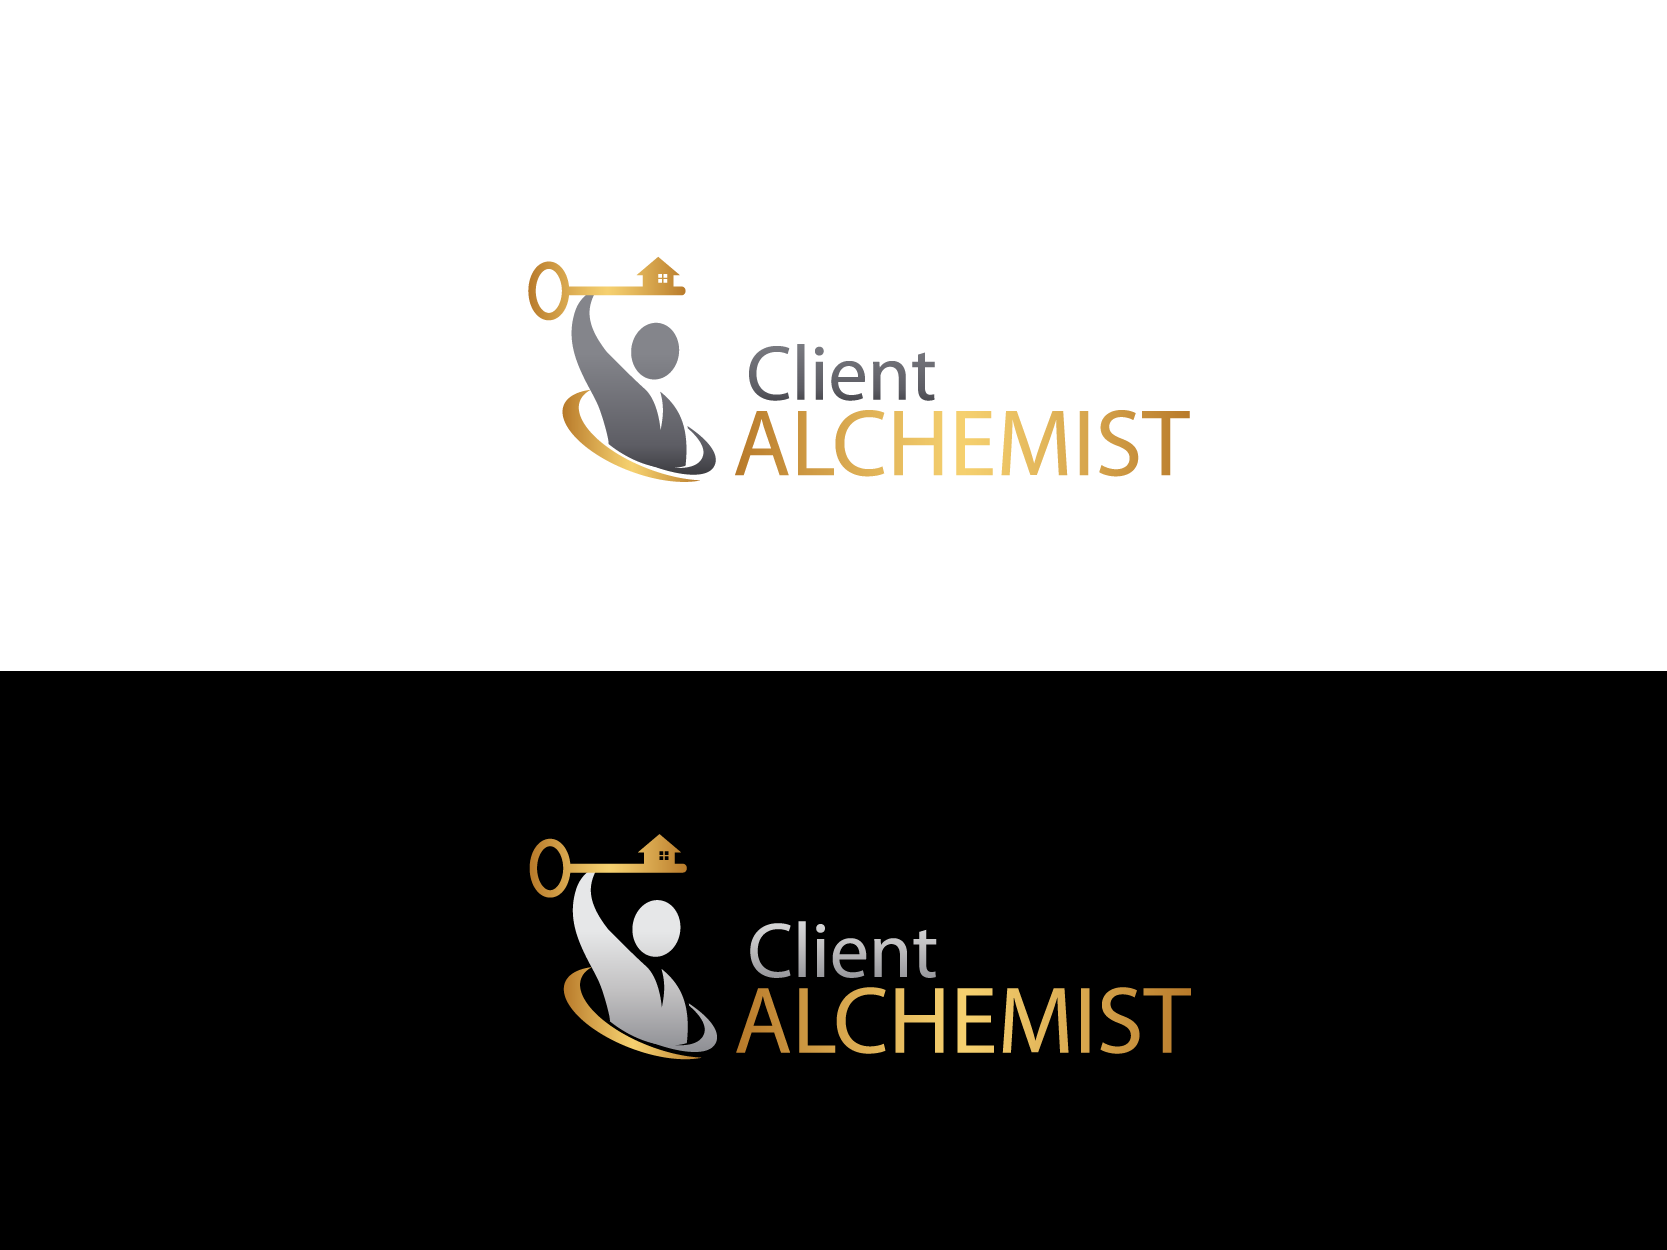 Create a log for the Client Alchemist